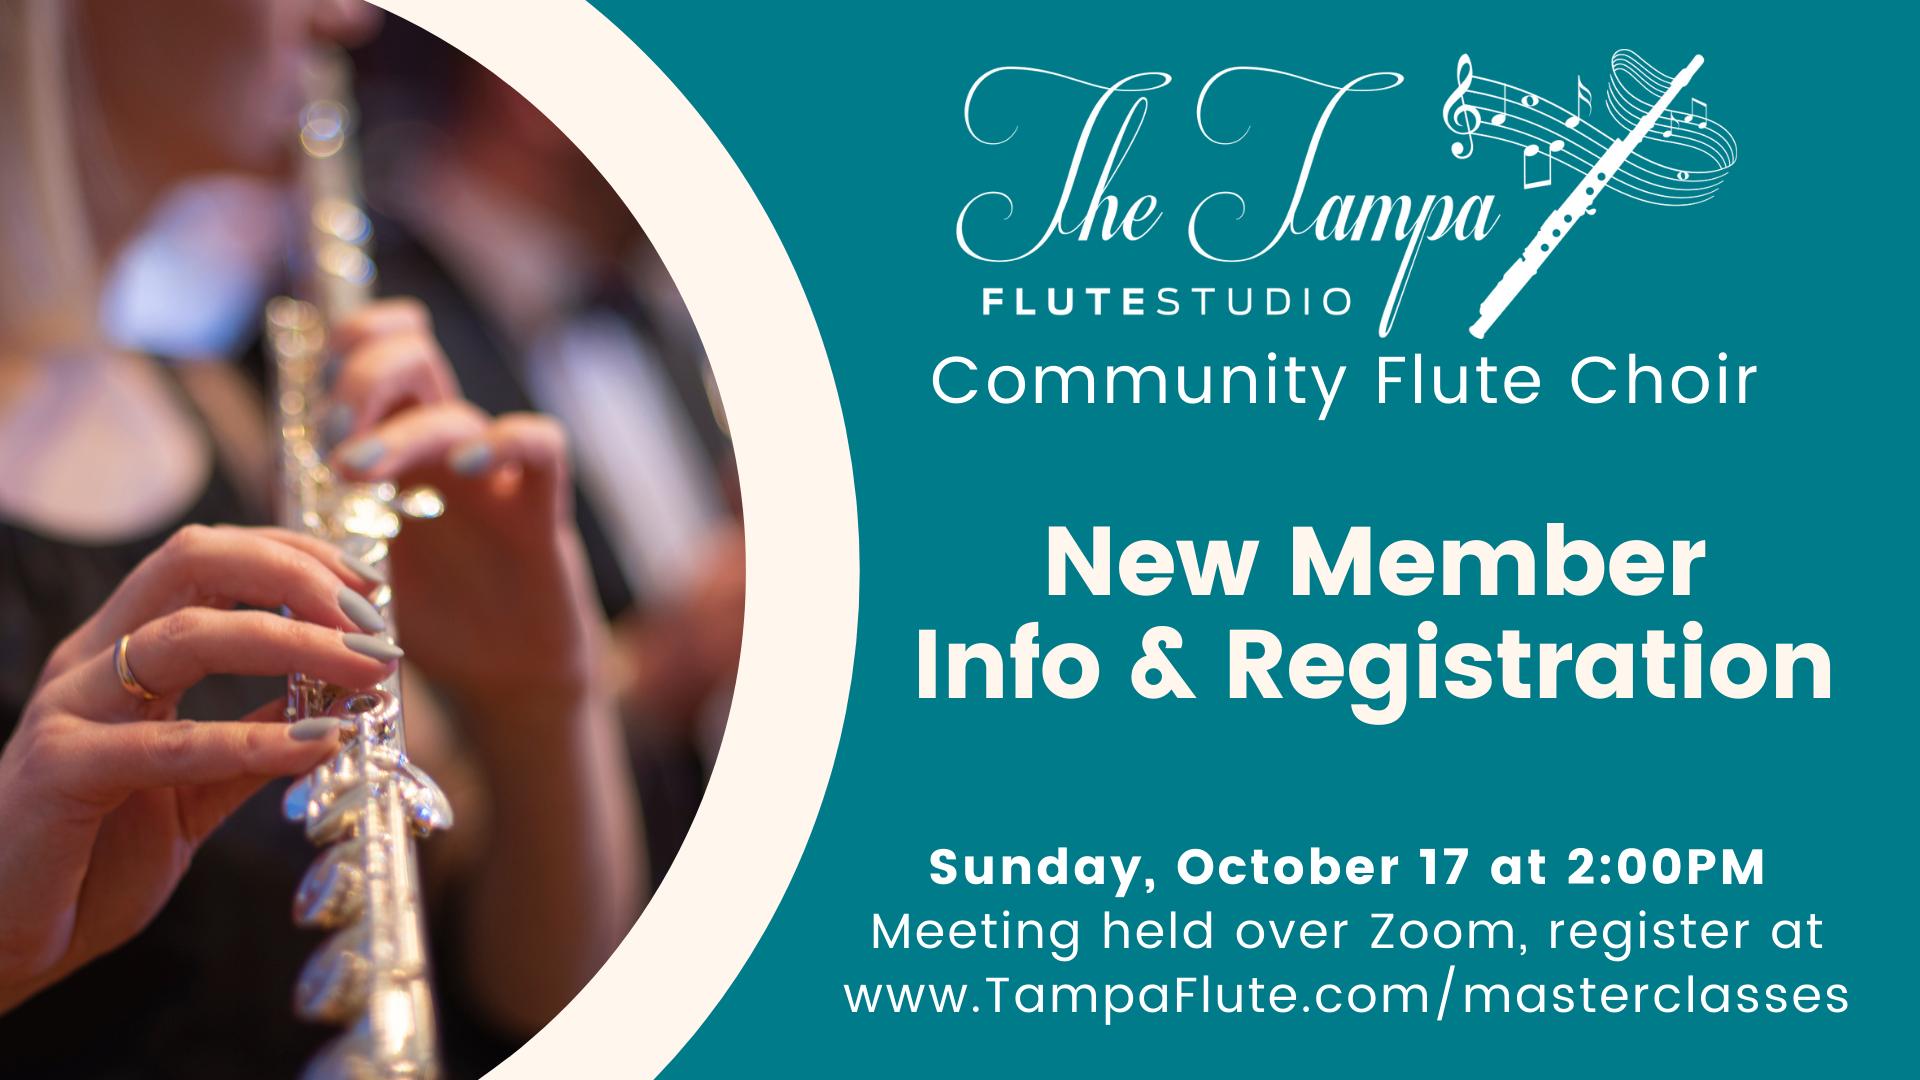 Community Flute Choir Orientation